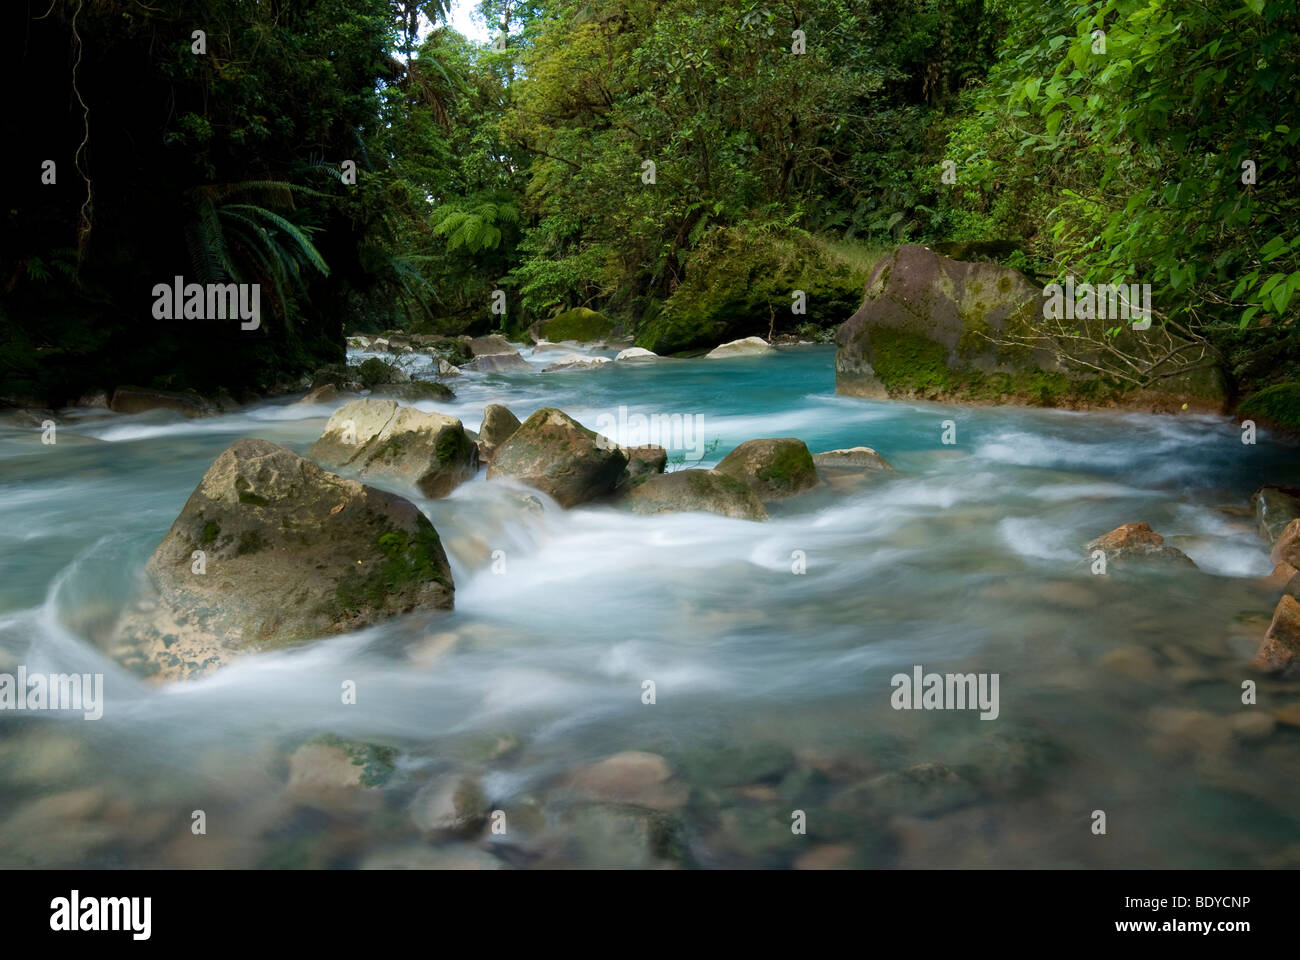 Stromschnellen in Rio Celeste, Tenorio Vulkan-Nationalpark, Costa Rica. Stockbild